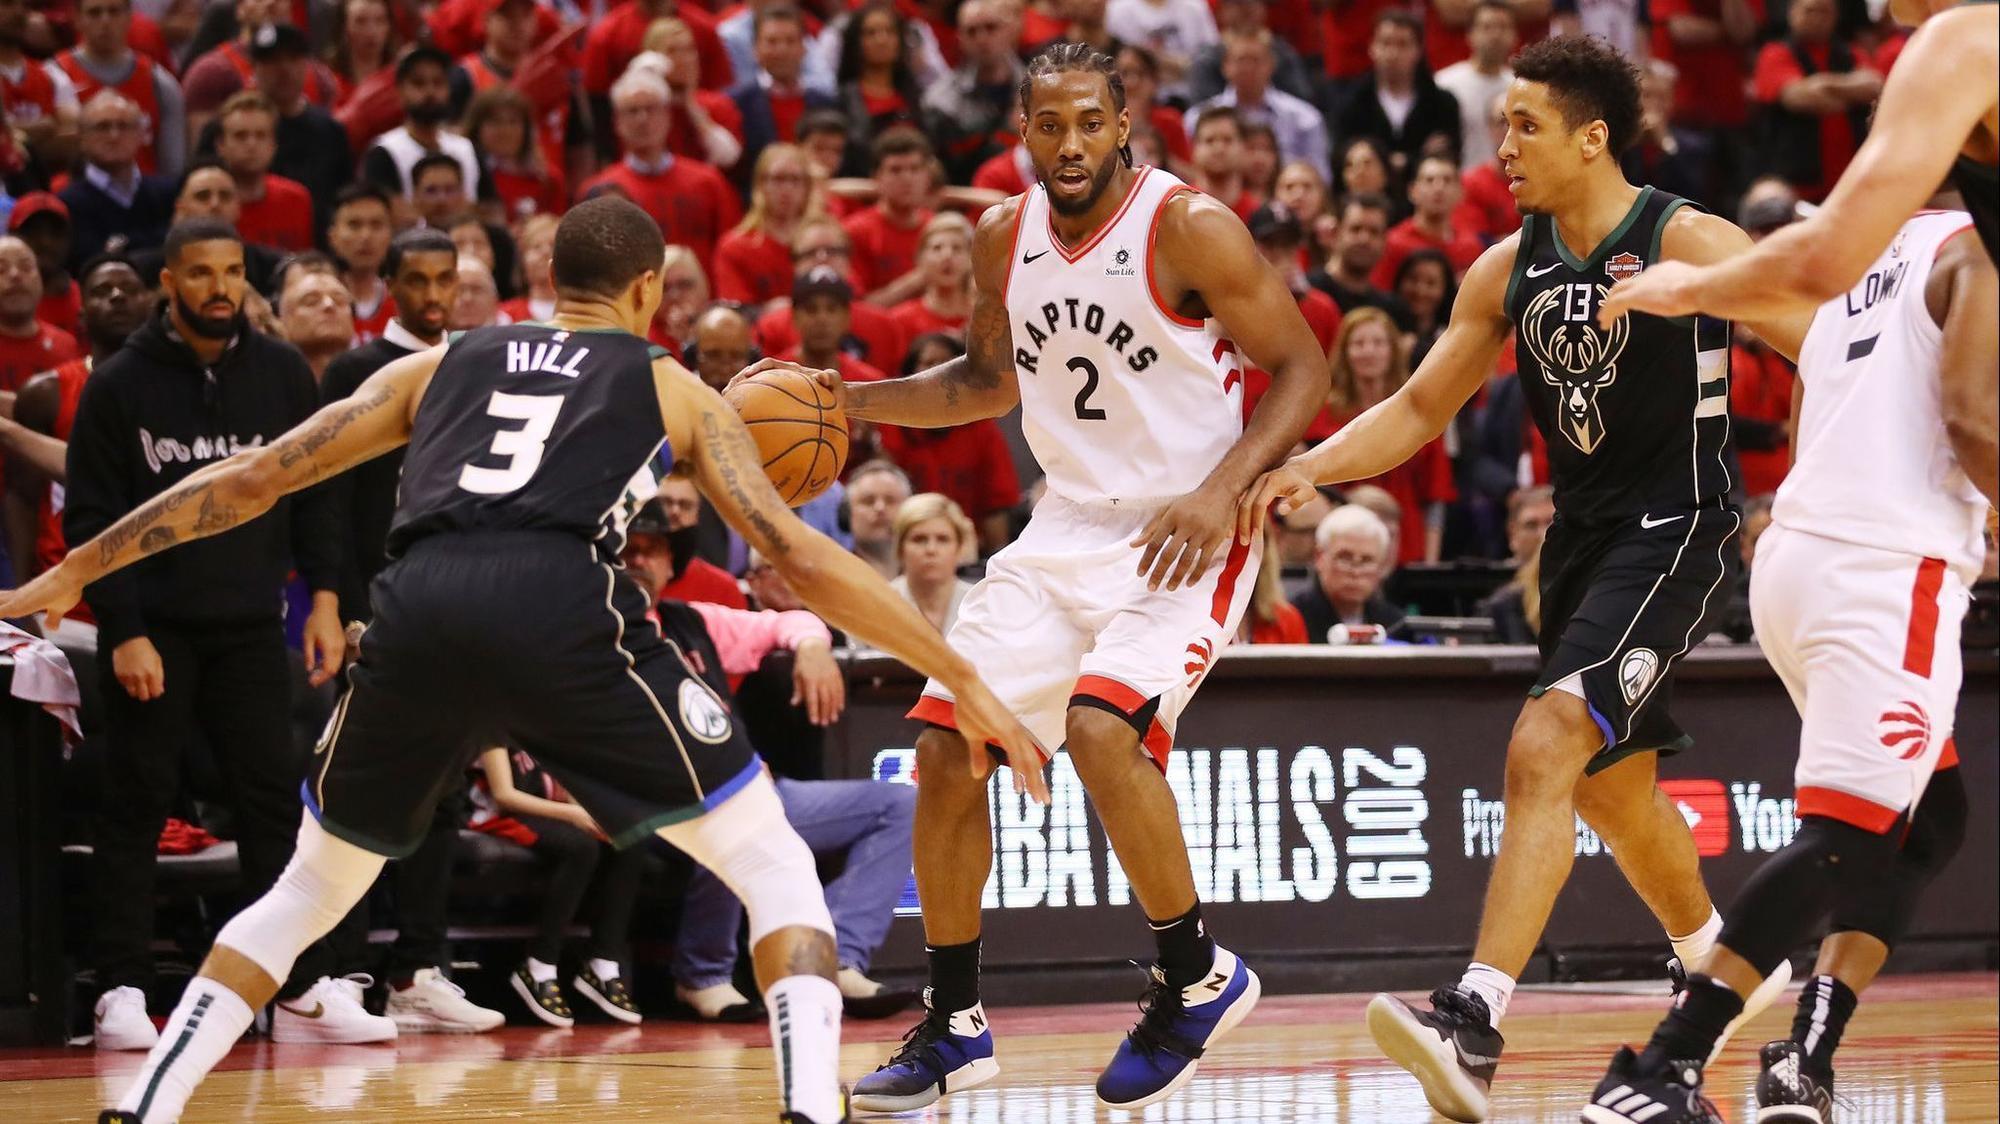 Raptors beat the Bucks to advance to first NBA Finals